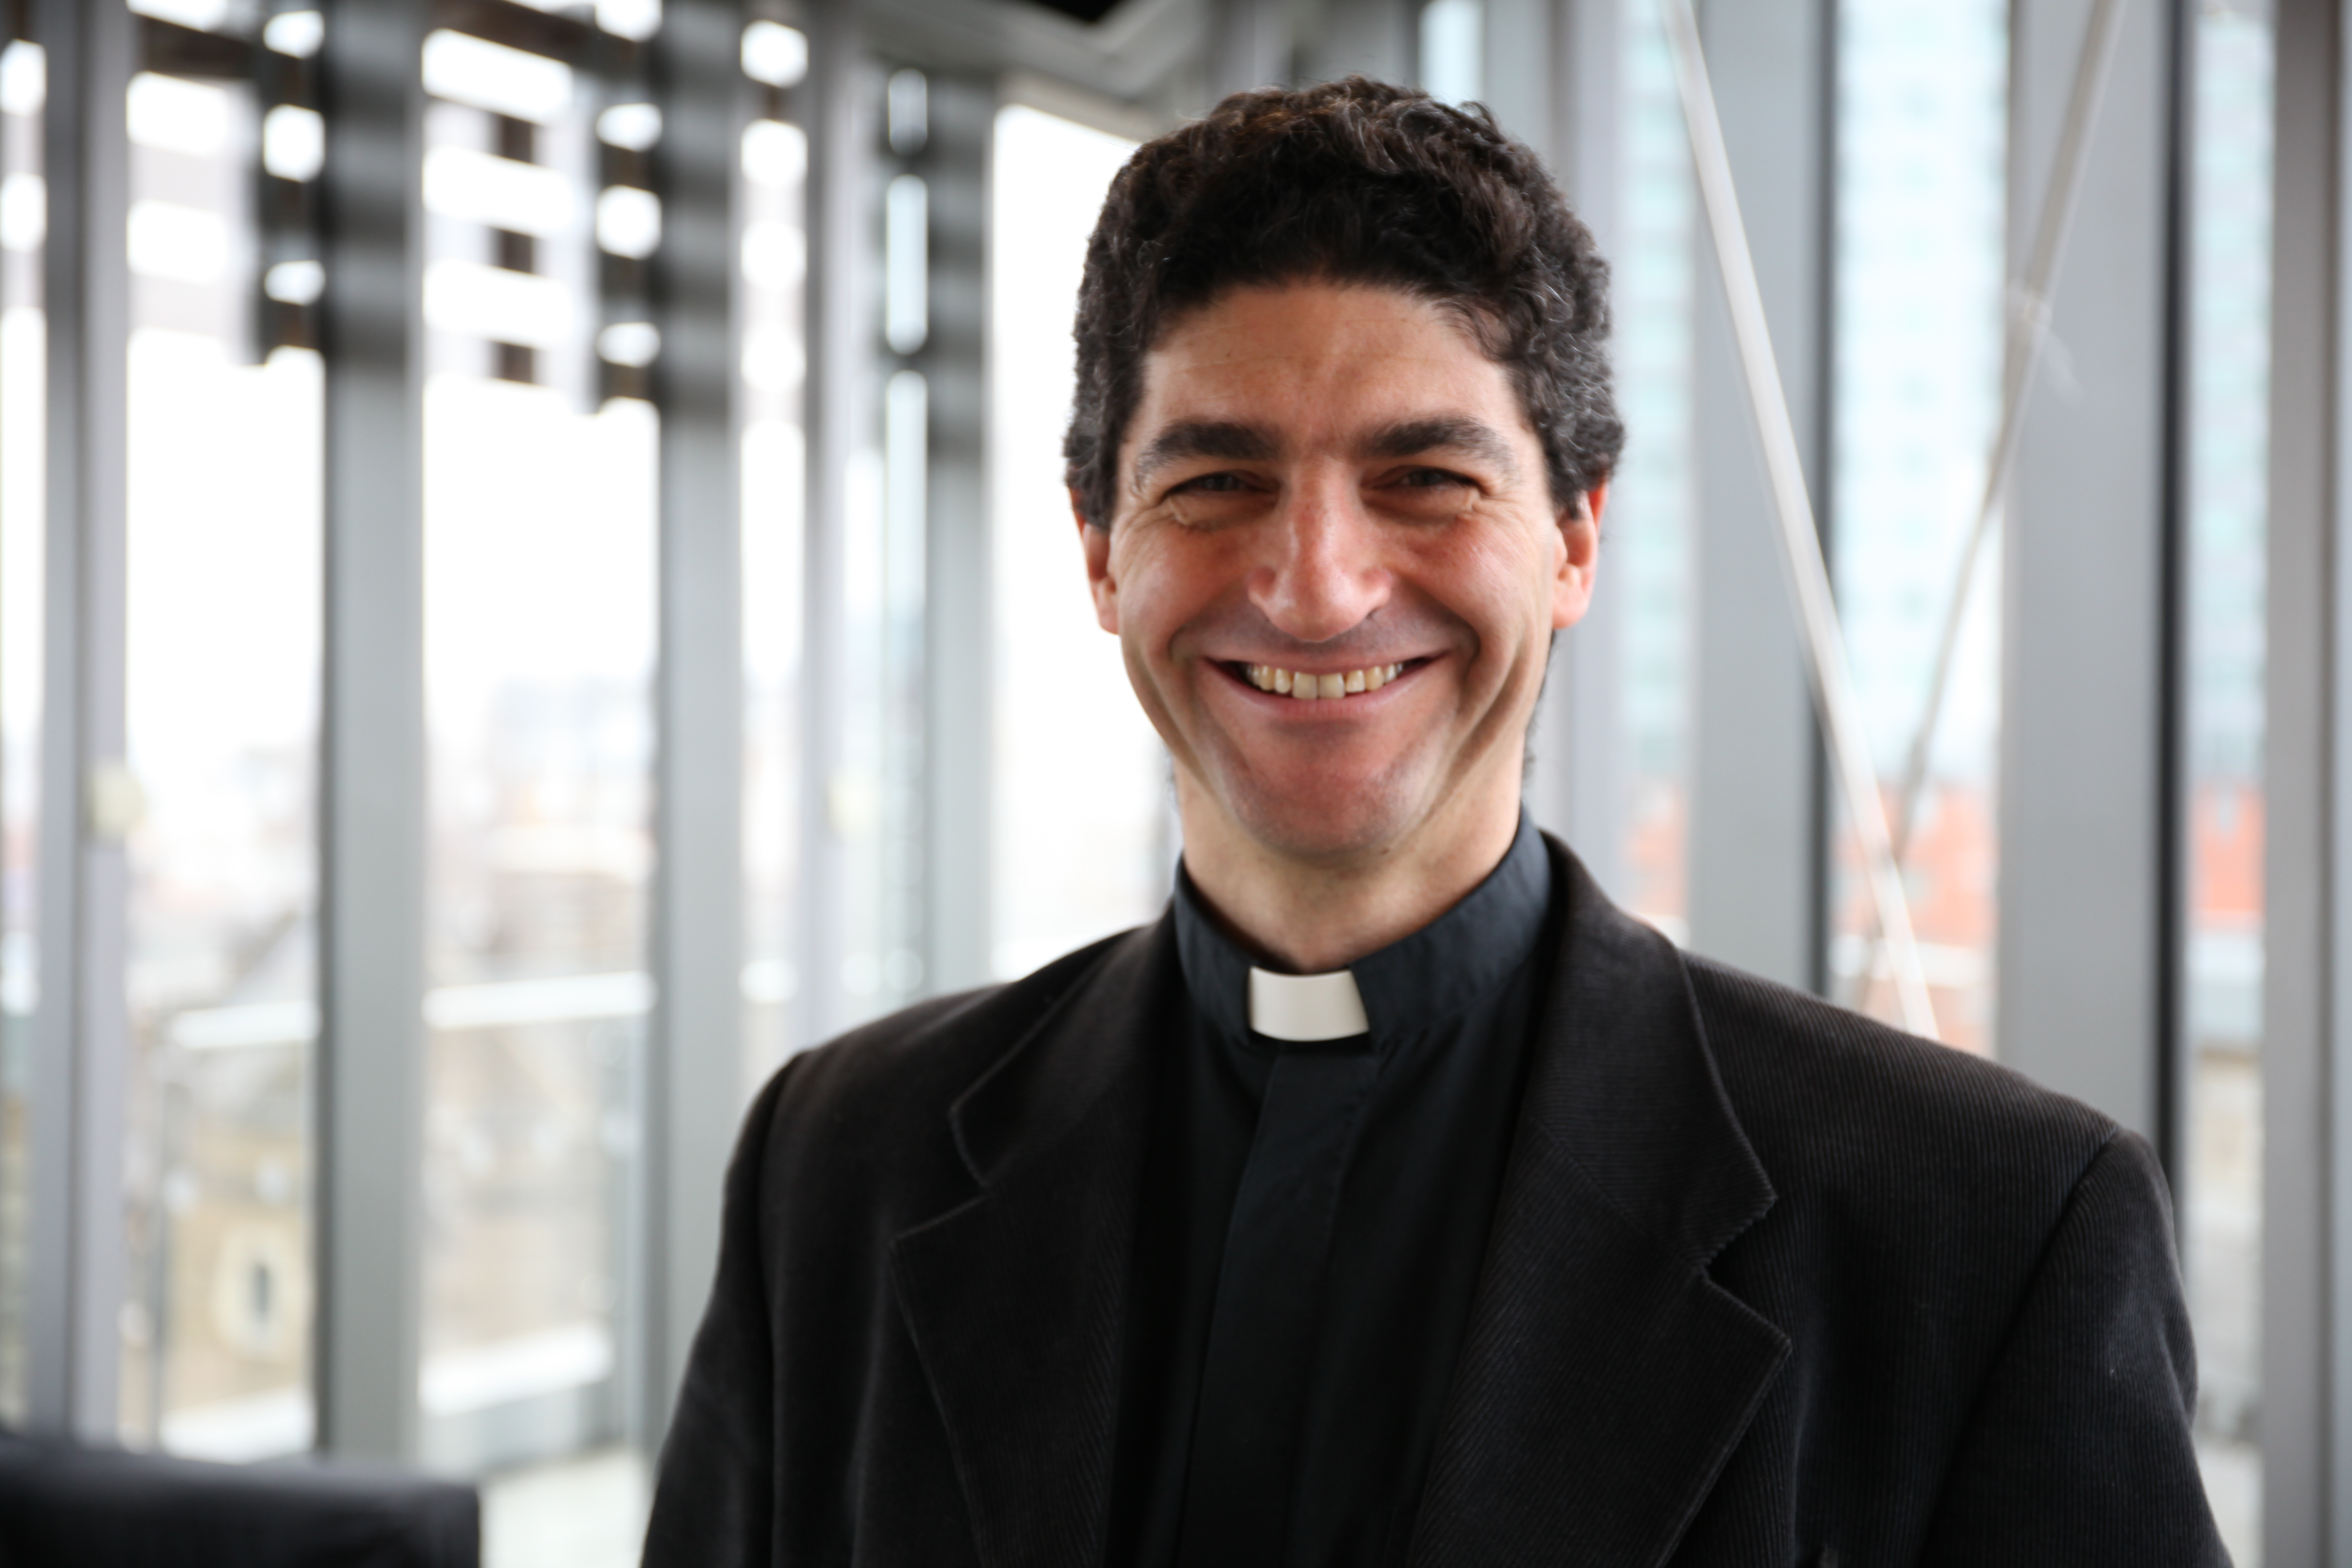 Father Augusto Zampini-Davies